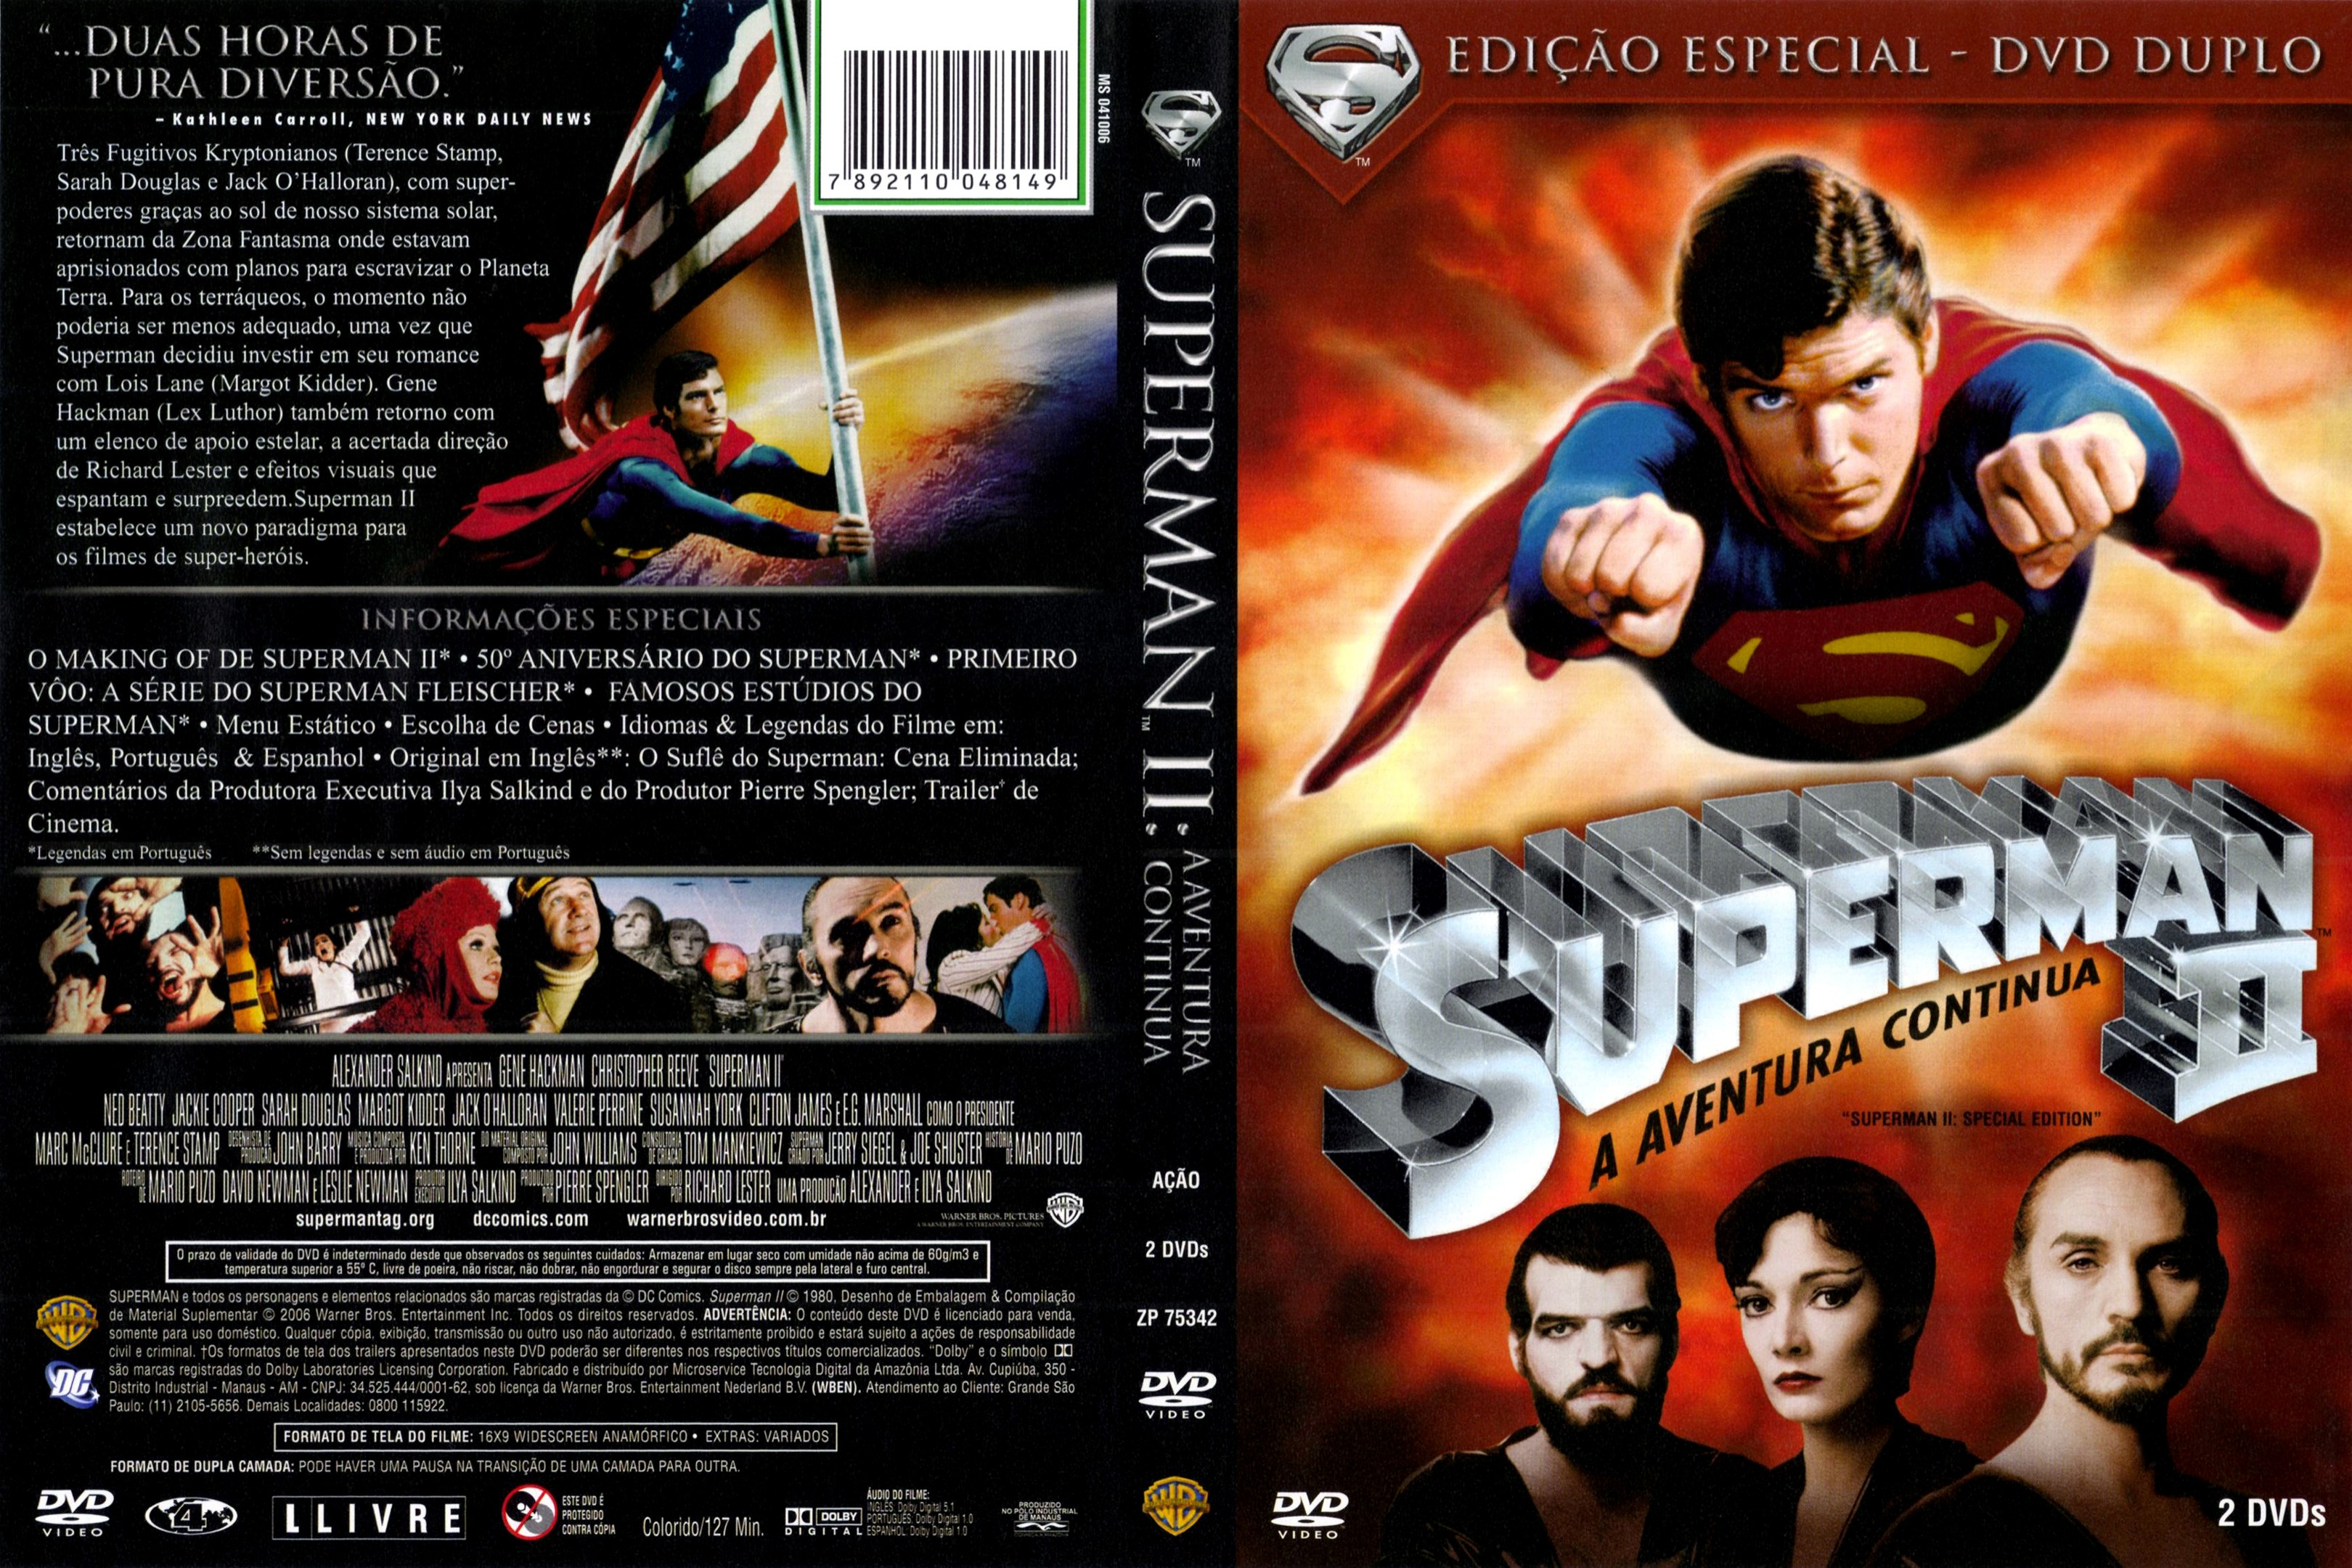 SupermanIIAAventuraContinua